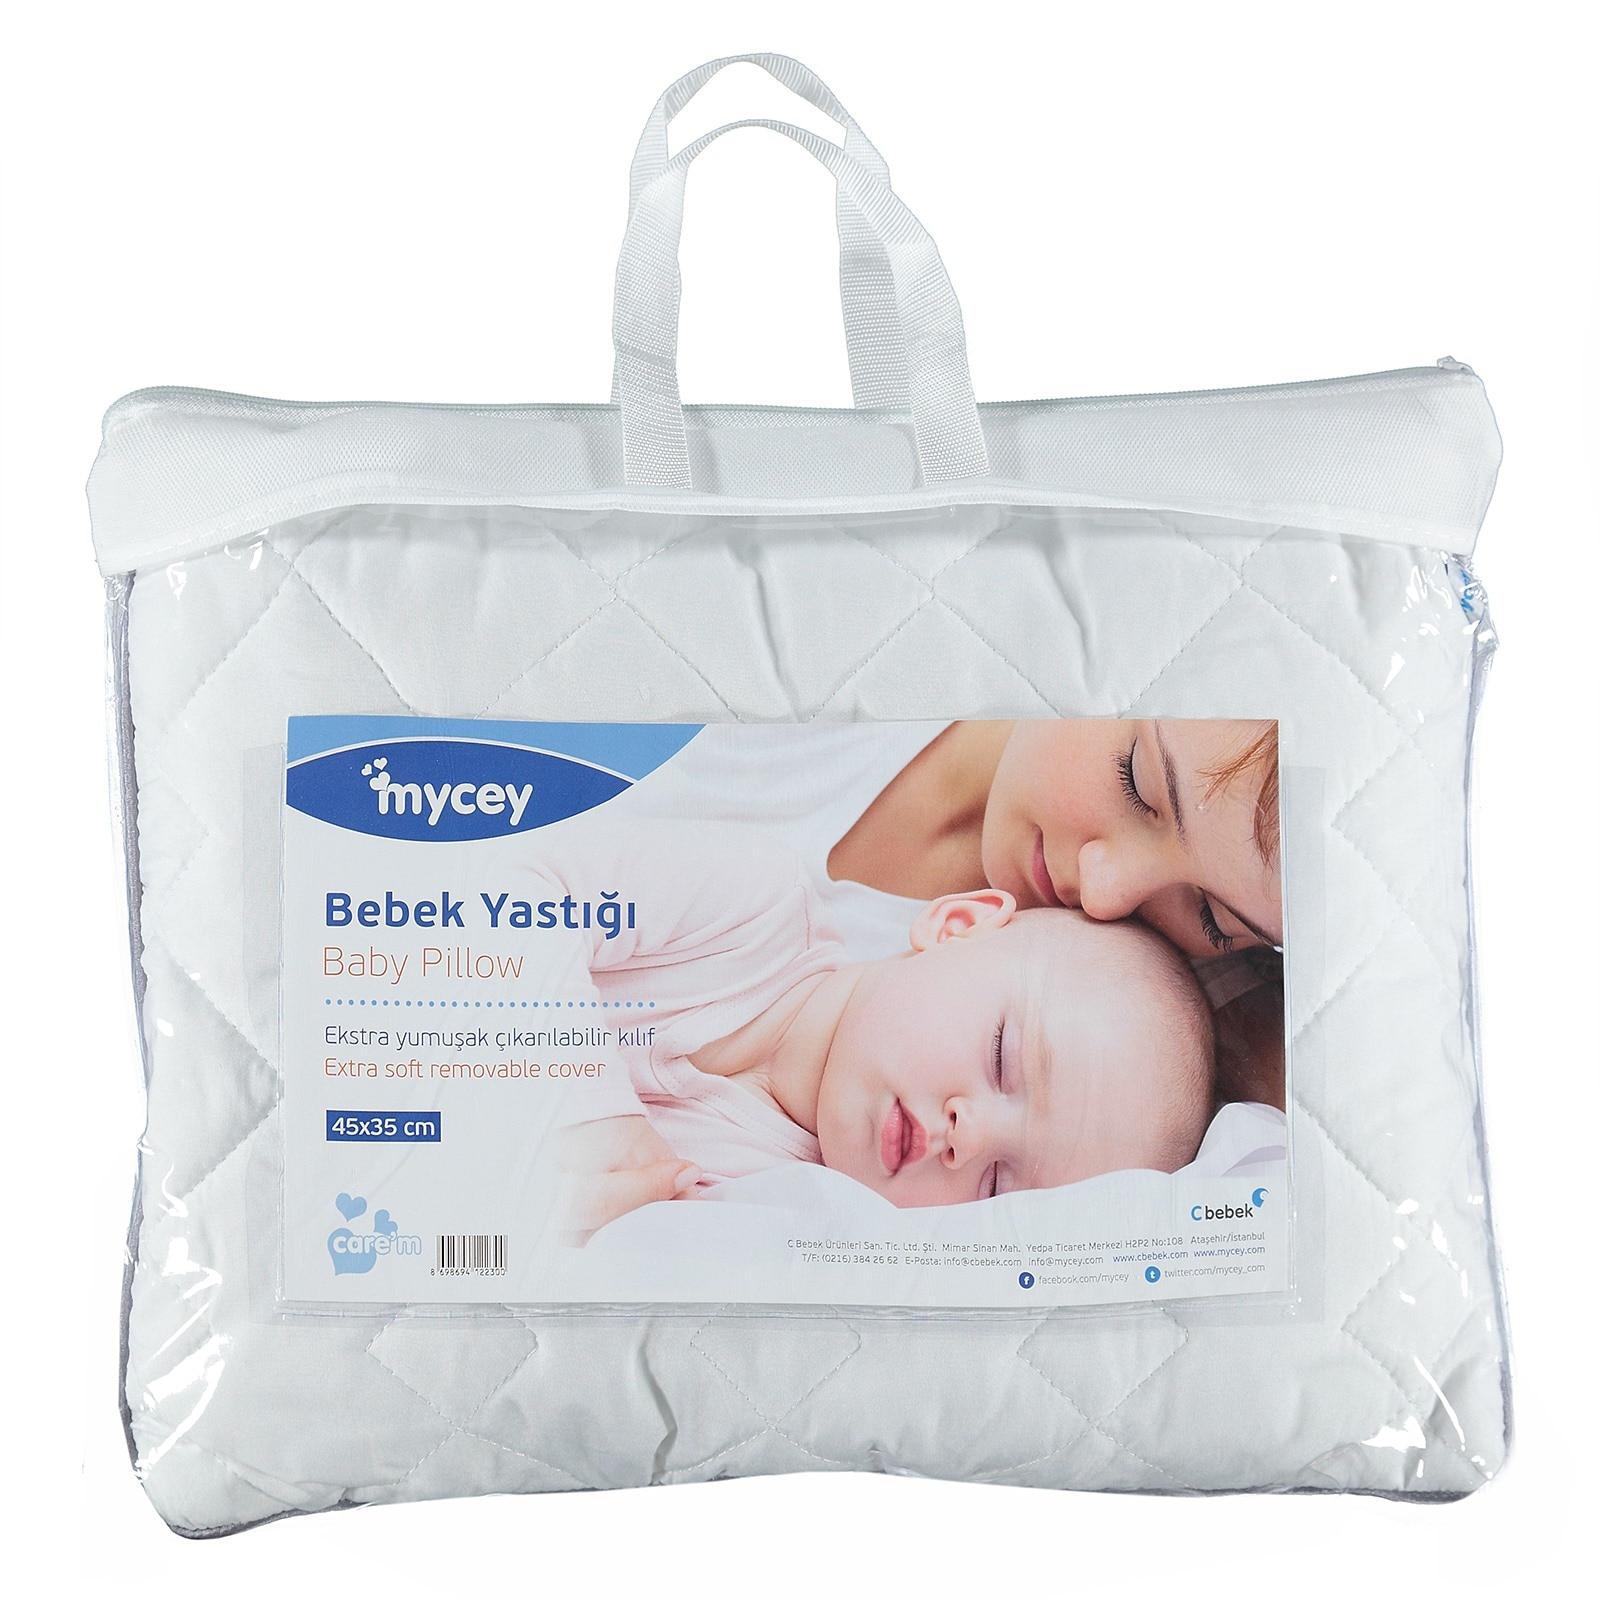 Ebebek Mycey Microfiber Baby Pillow